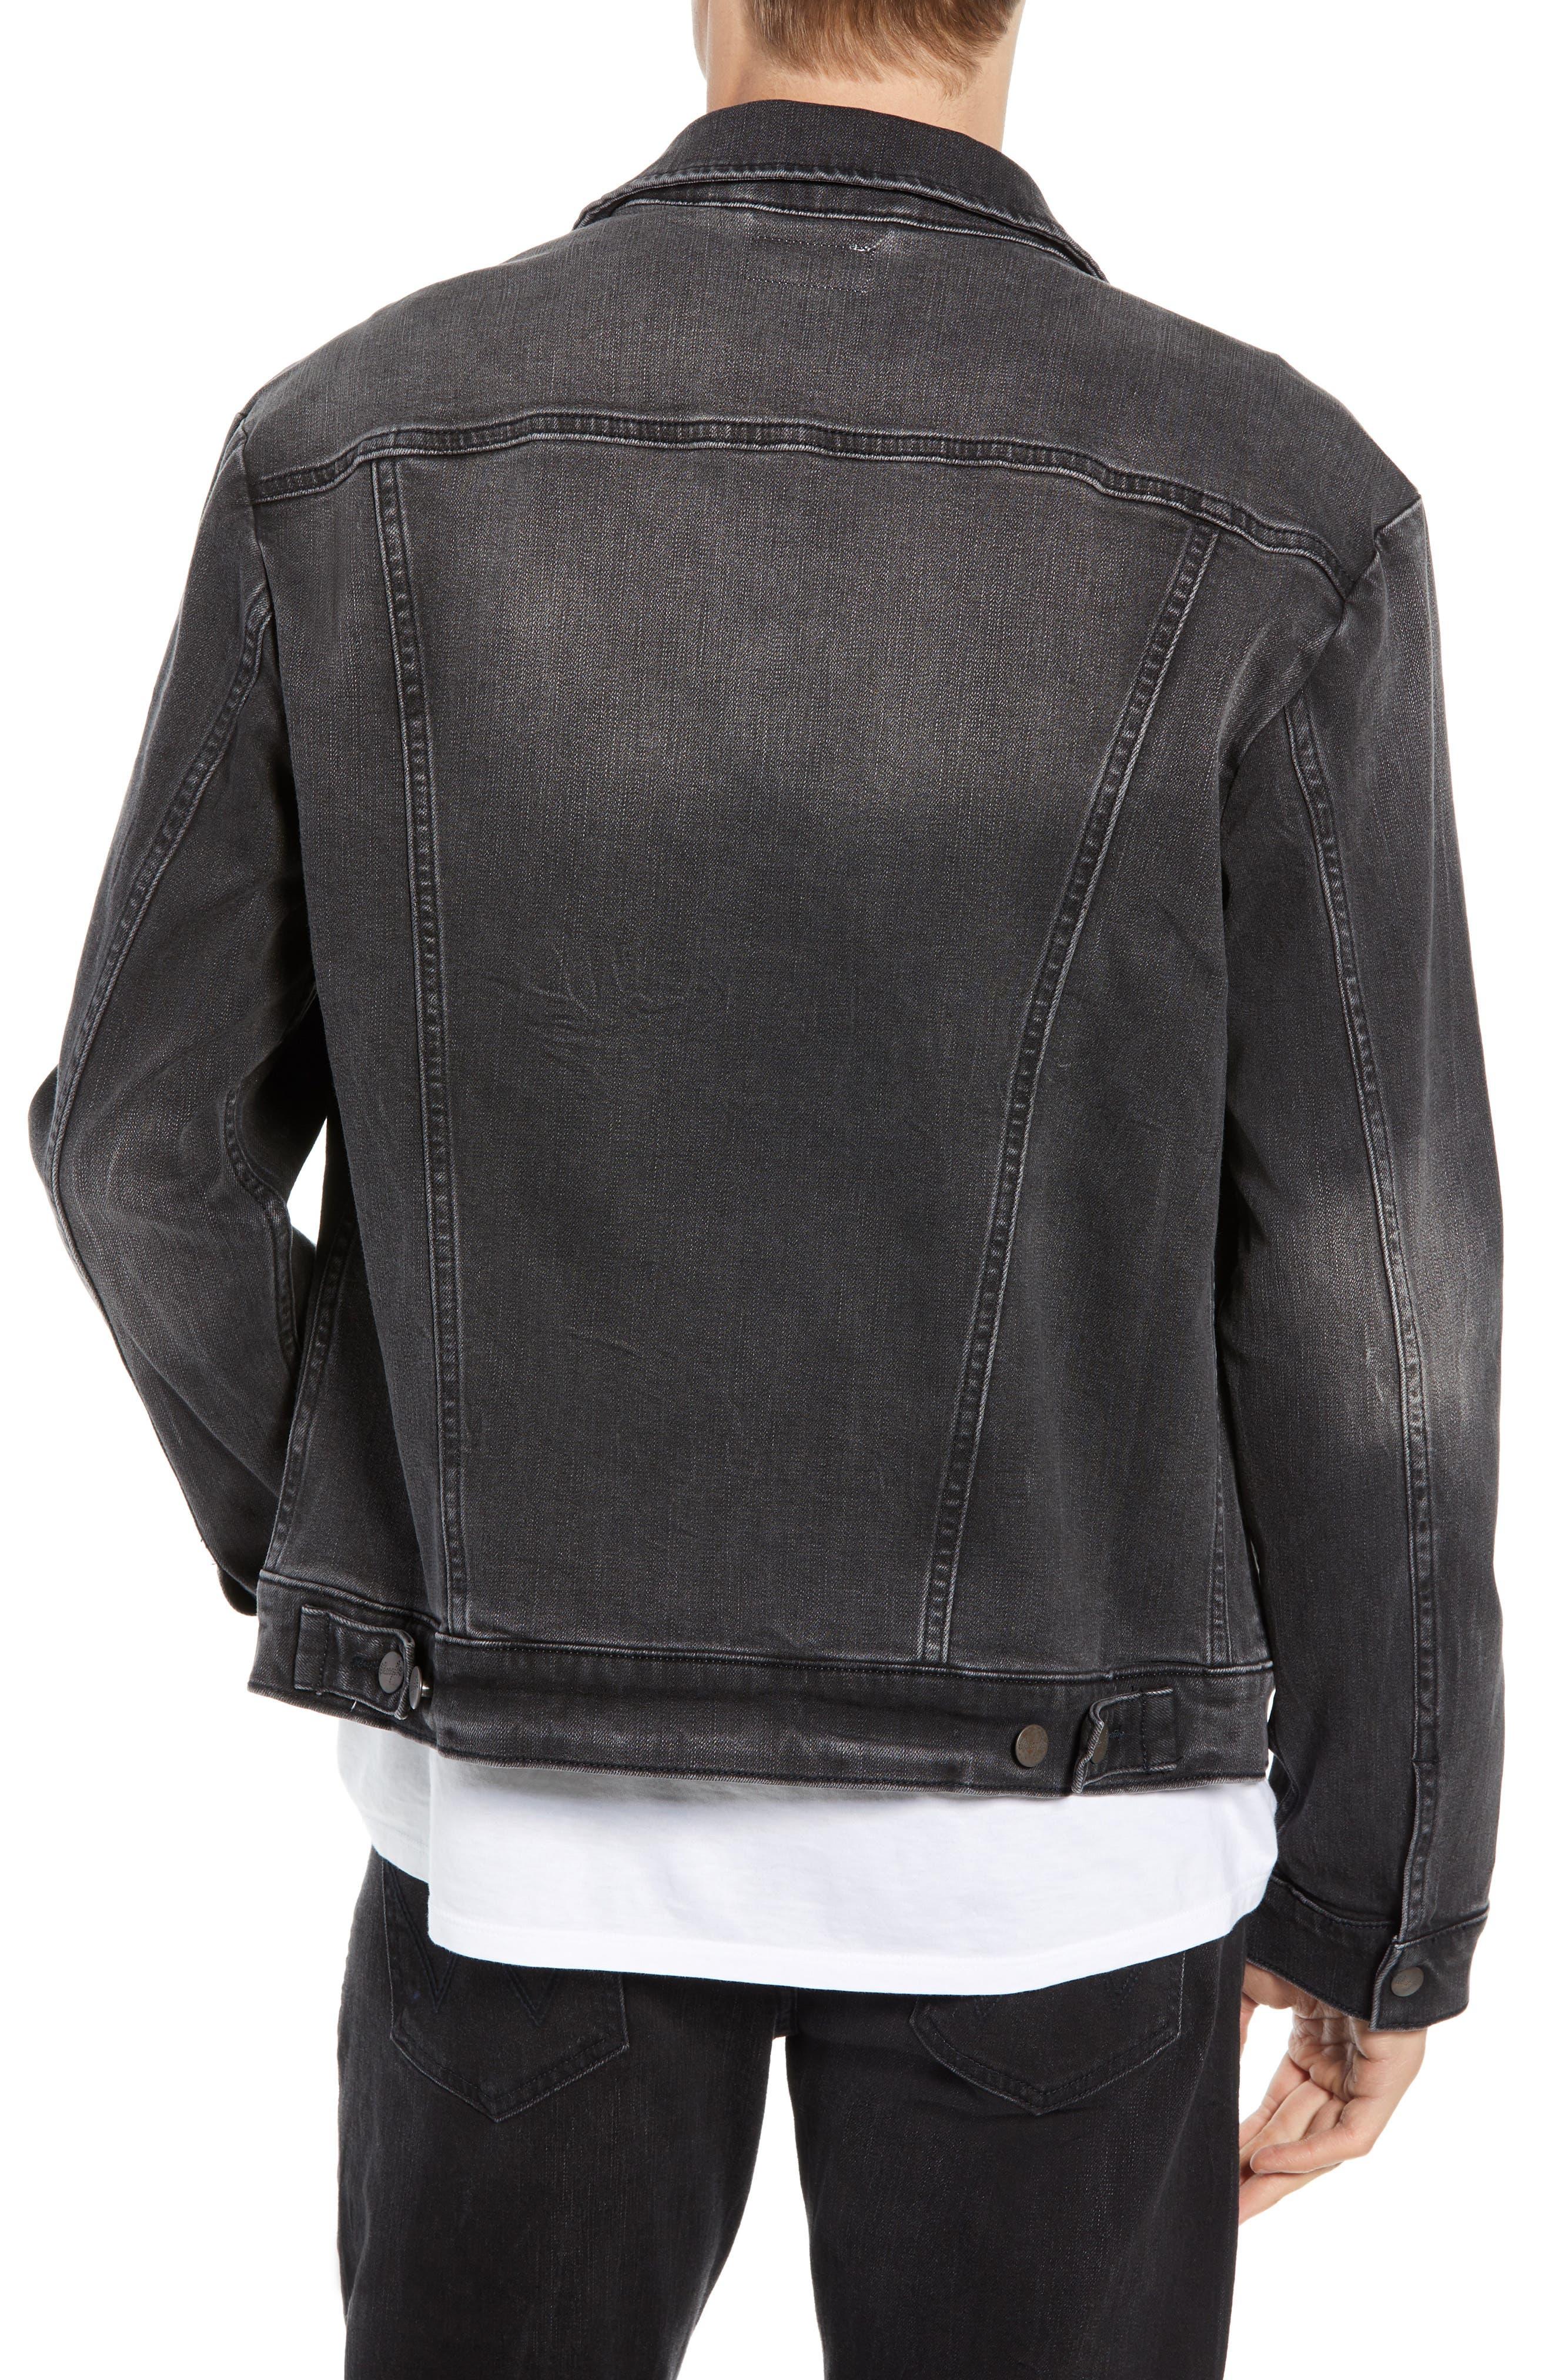 Heritage Pleated Denim Jacket,                             Alternate thumbnail 2, color,                             GREY DESTRUCT